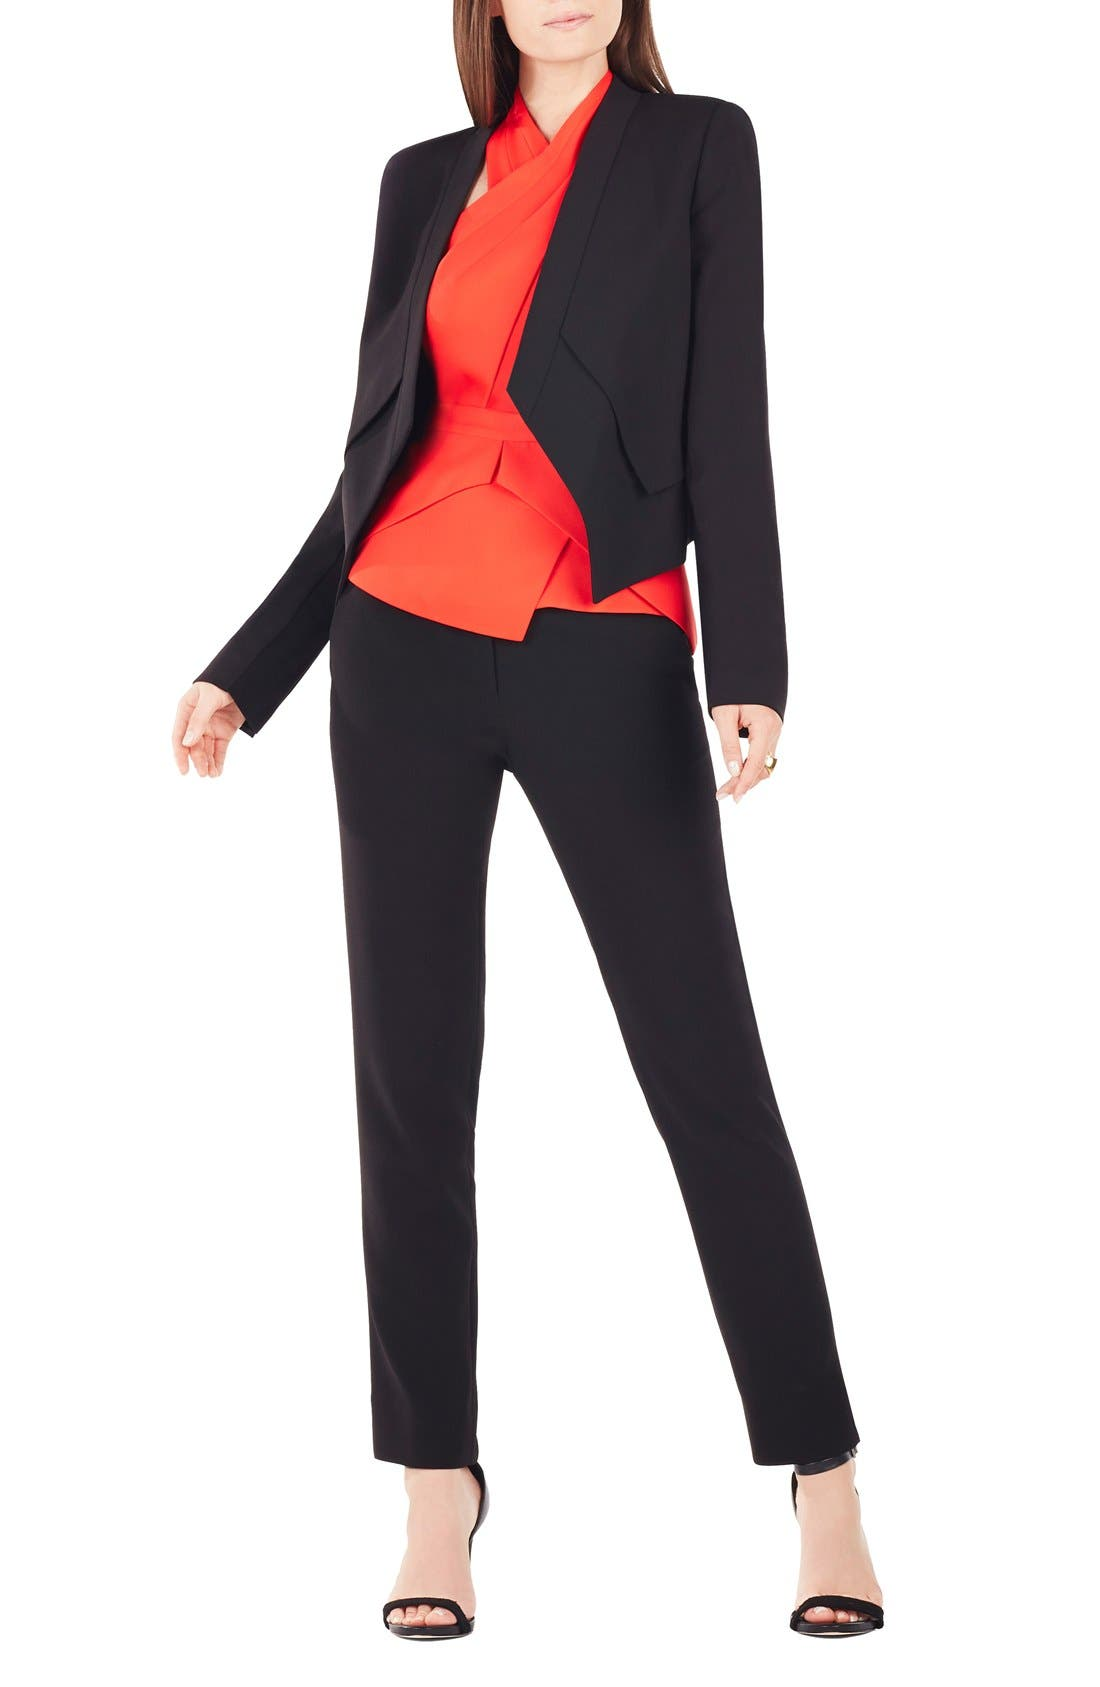 Alternate Image 1 Selected - BCBGMAXAZRIA 'Lloyd' Twill Tuxedo Jacket